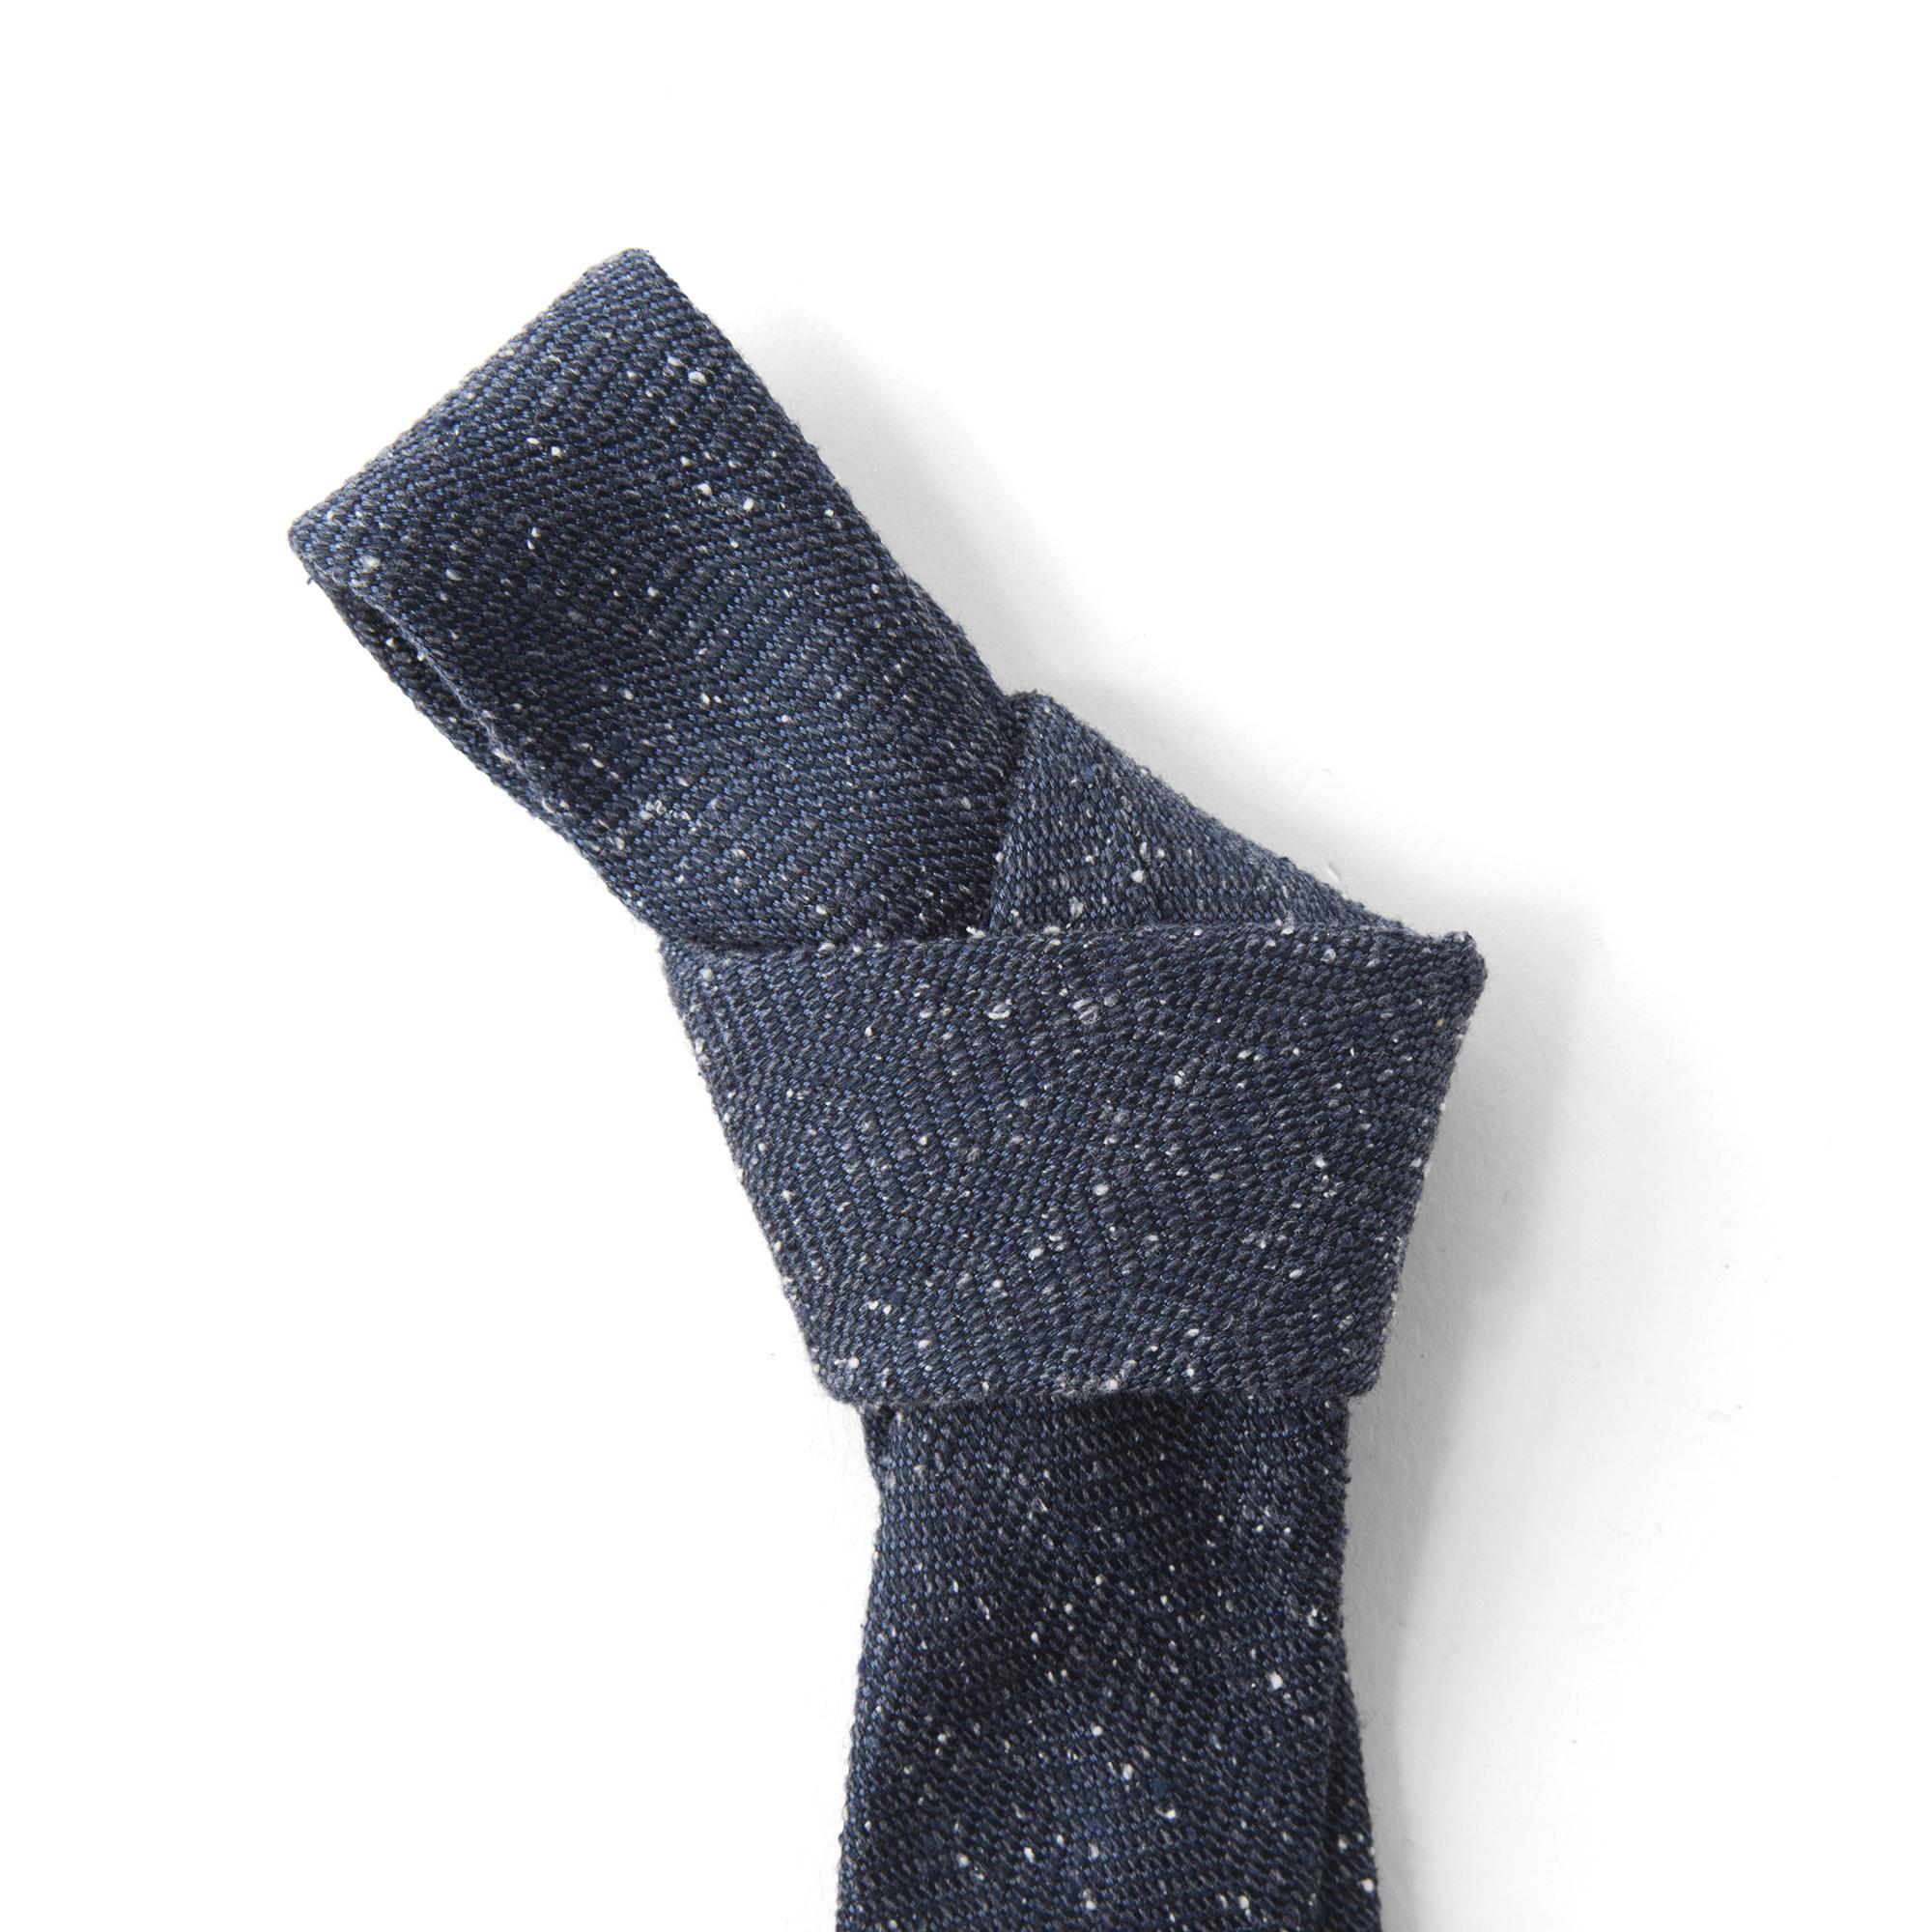 The Tie Bar Threaded Zig-zag Tie | Bespoke Post